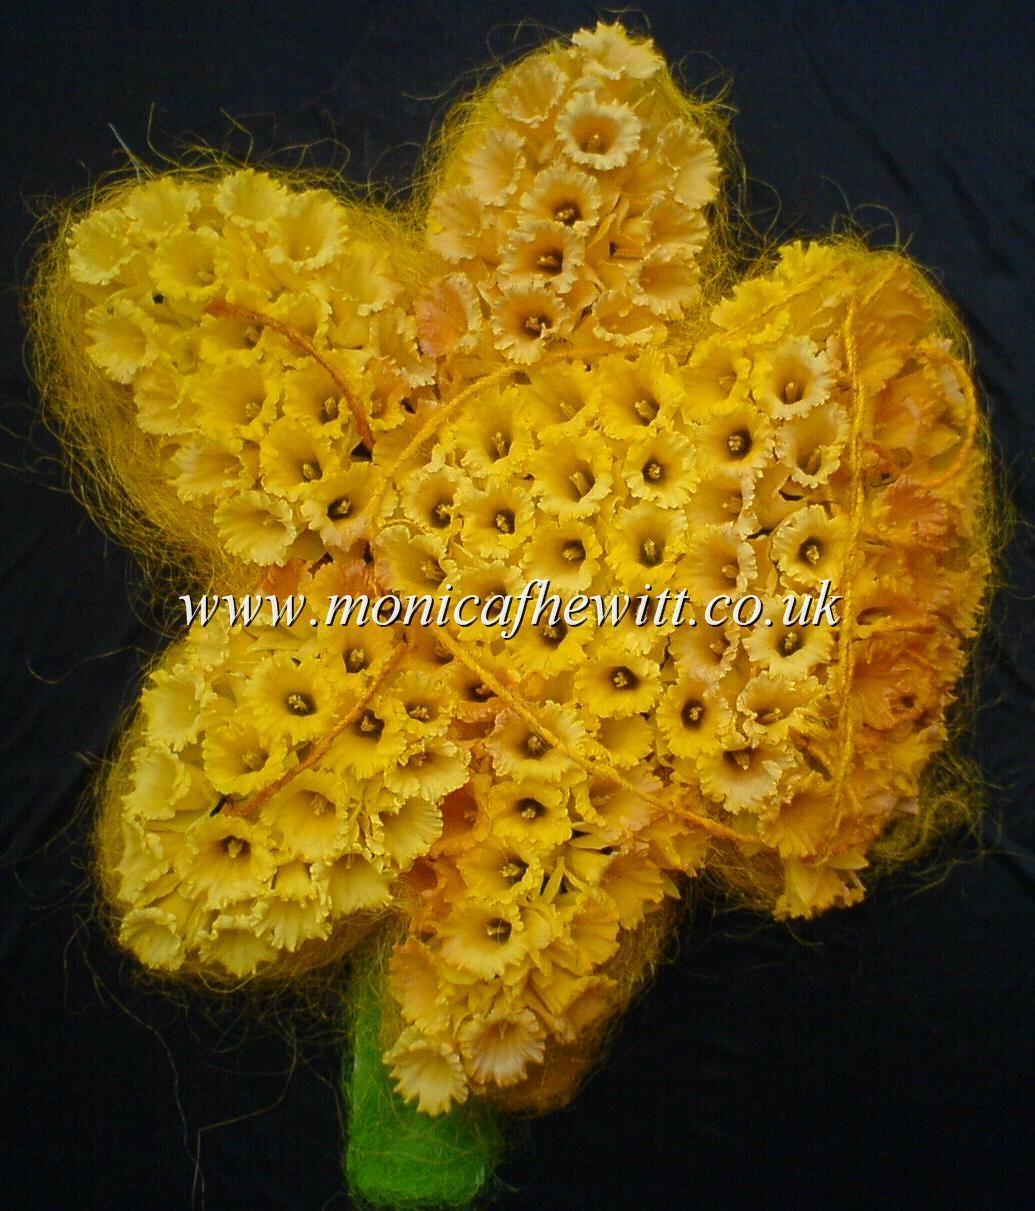 Daffodil Funeral Flowers Monica F Hewitt Florist Sheffield